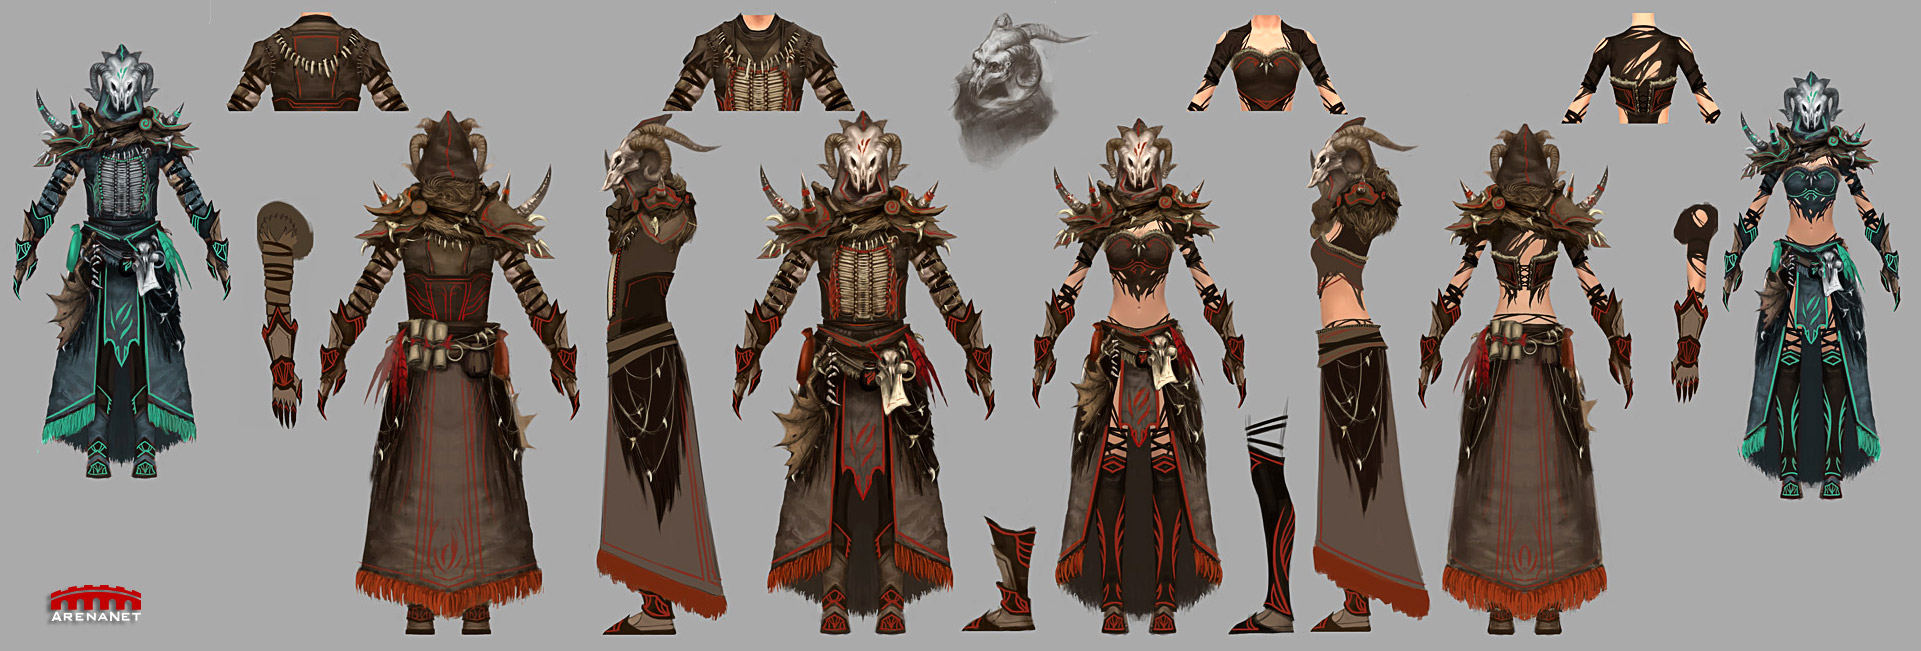 guild wars 2 armor - photo #40